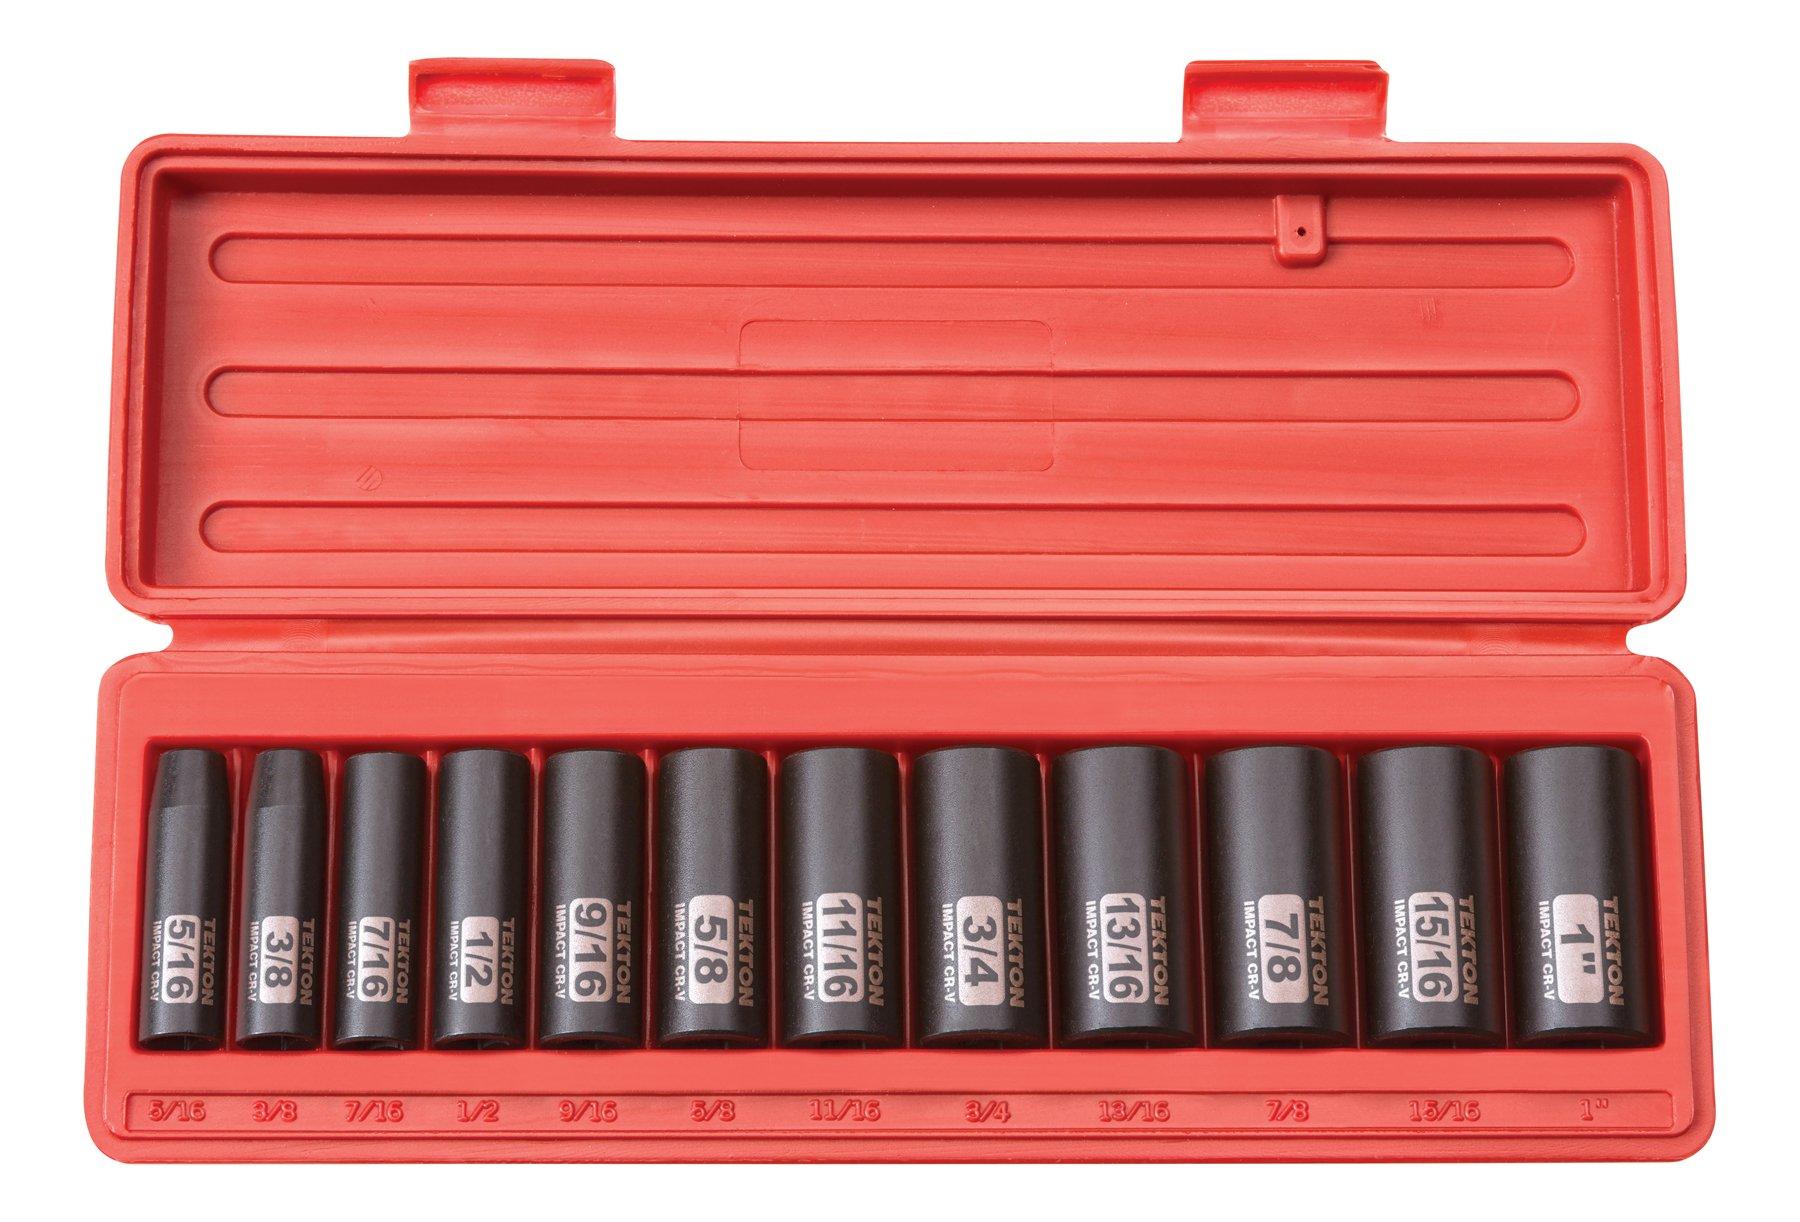 TEKTON 3/8-Inch Drive Deep Impact Socket Set, Inch, Cr-V, 12-Point, 5/16-Inch - 1-Inch, 12-Sockets | 47921 by TEKTON